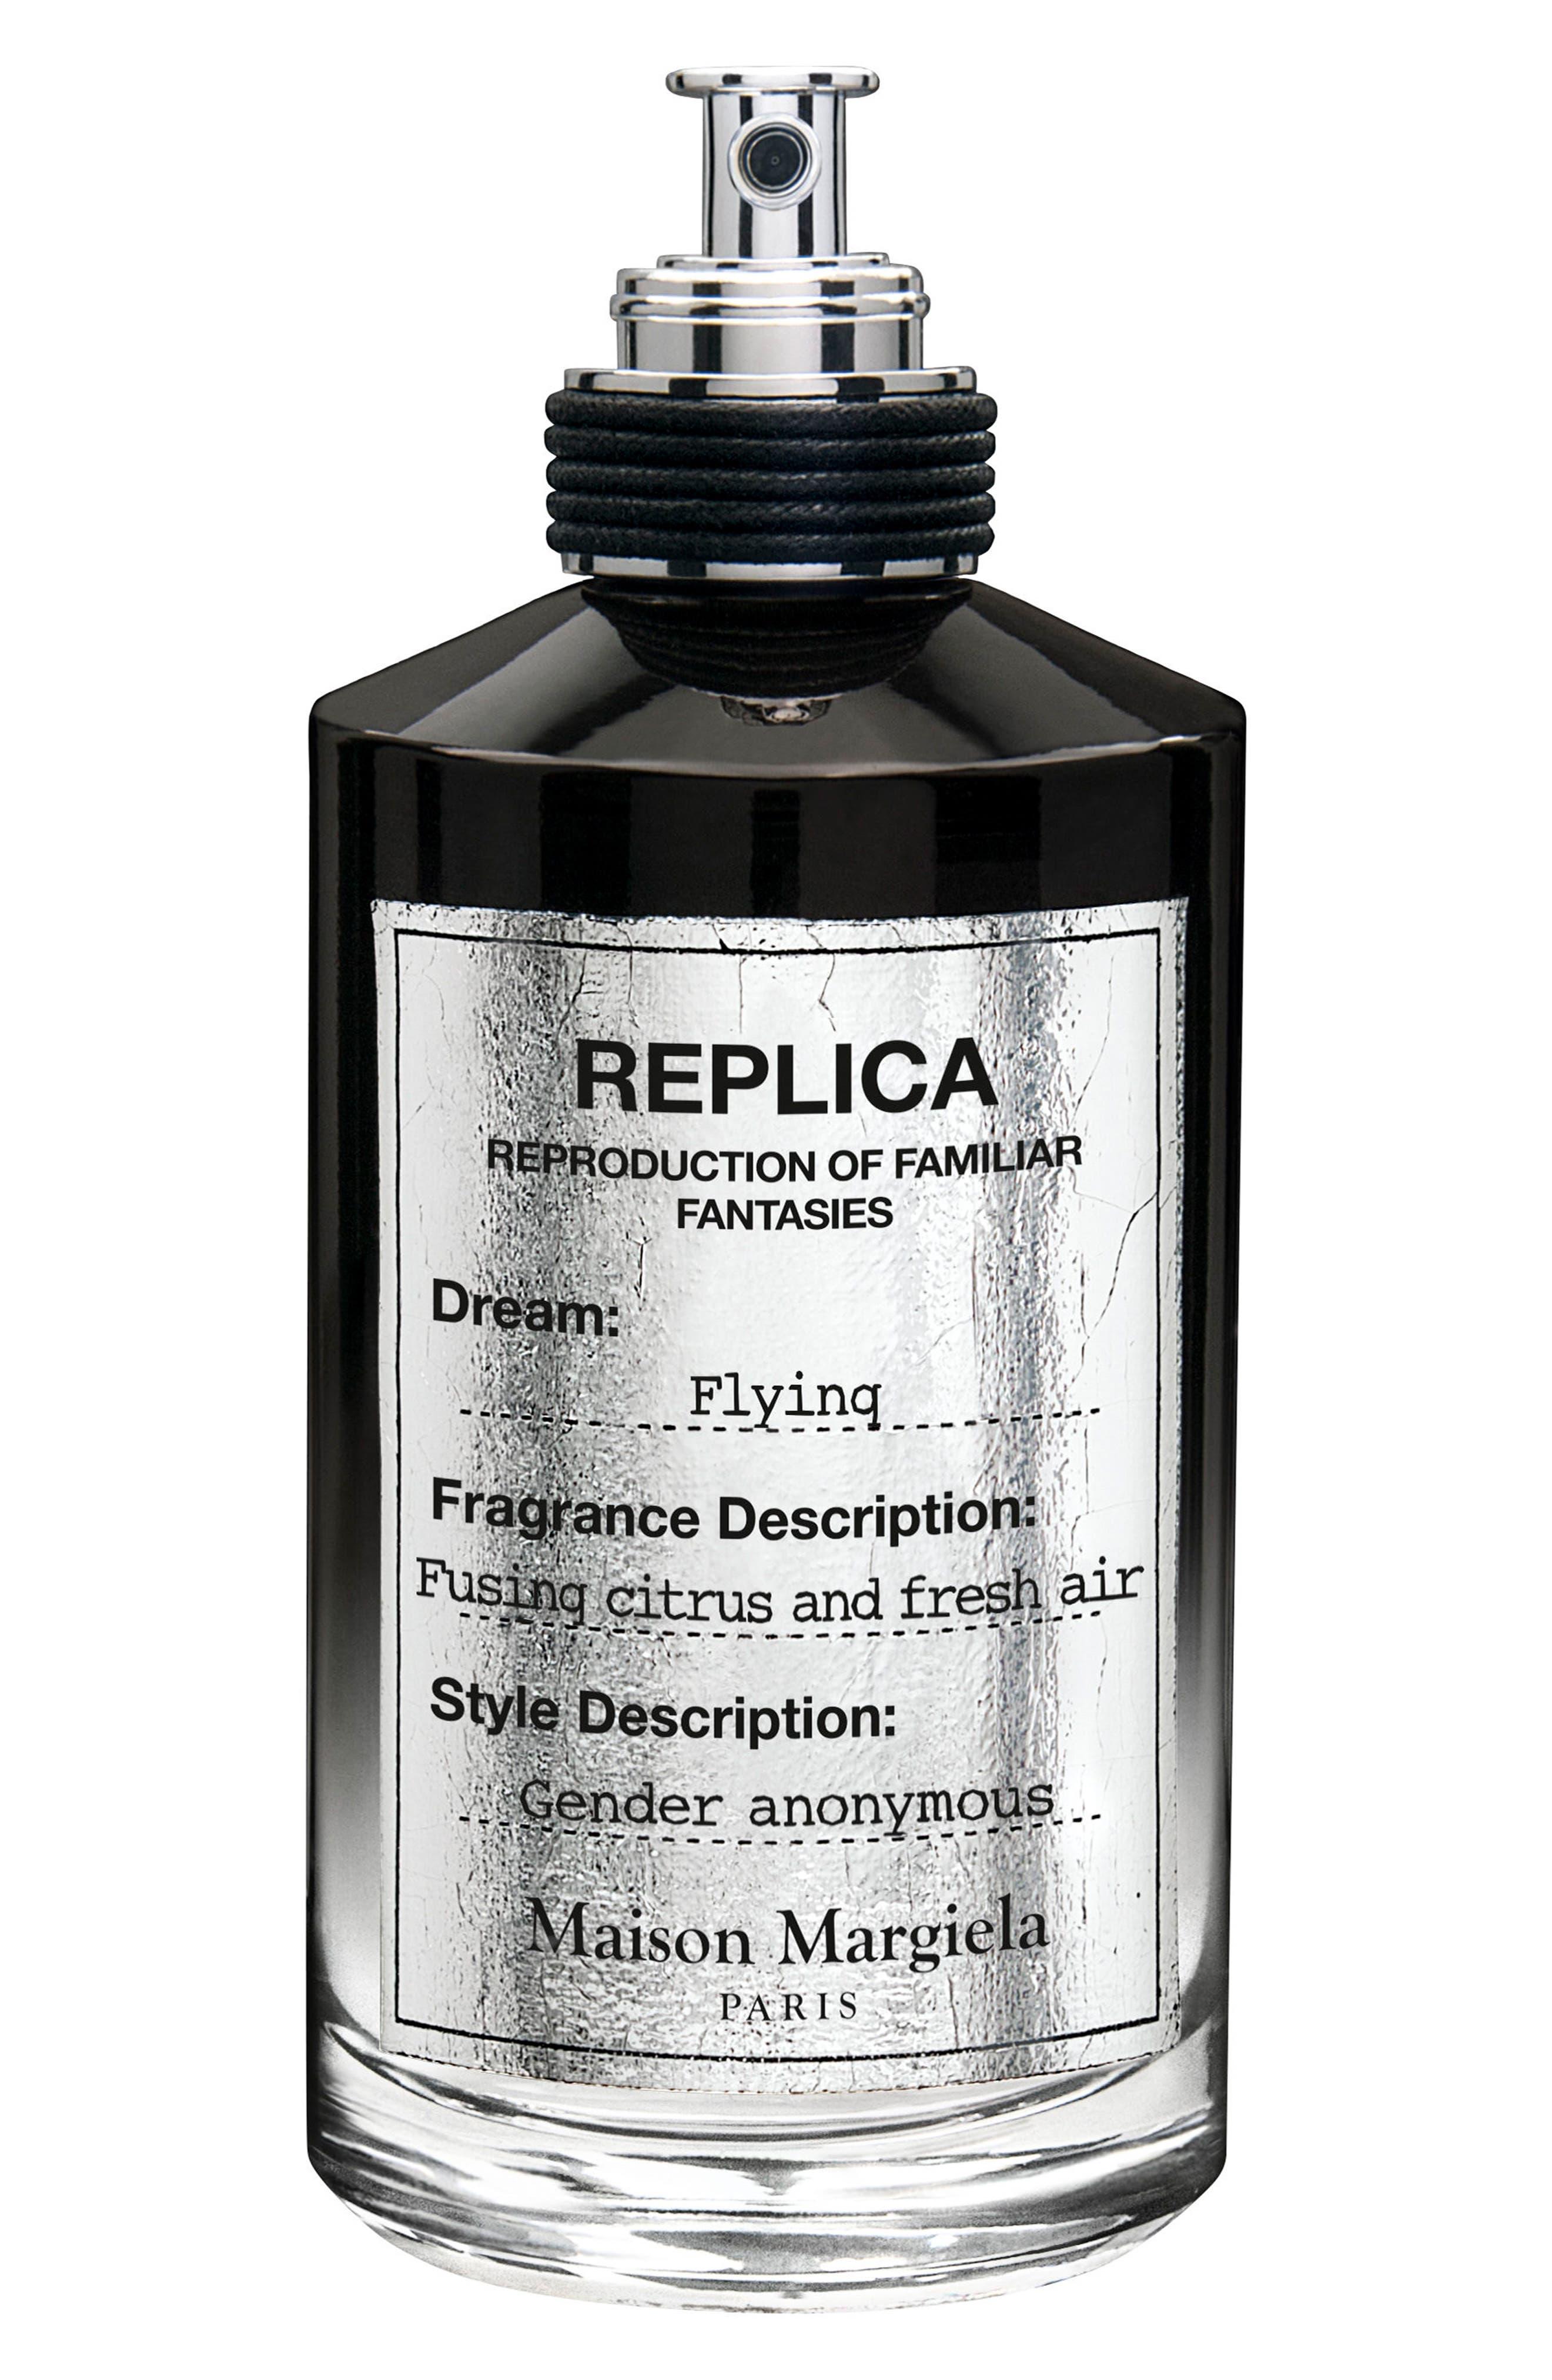 MAISON MARGIELA Replica Flying Eau de Parfum, Main, color, NO COLOR